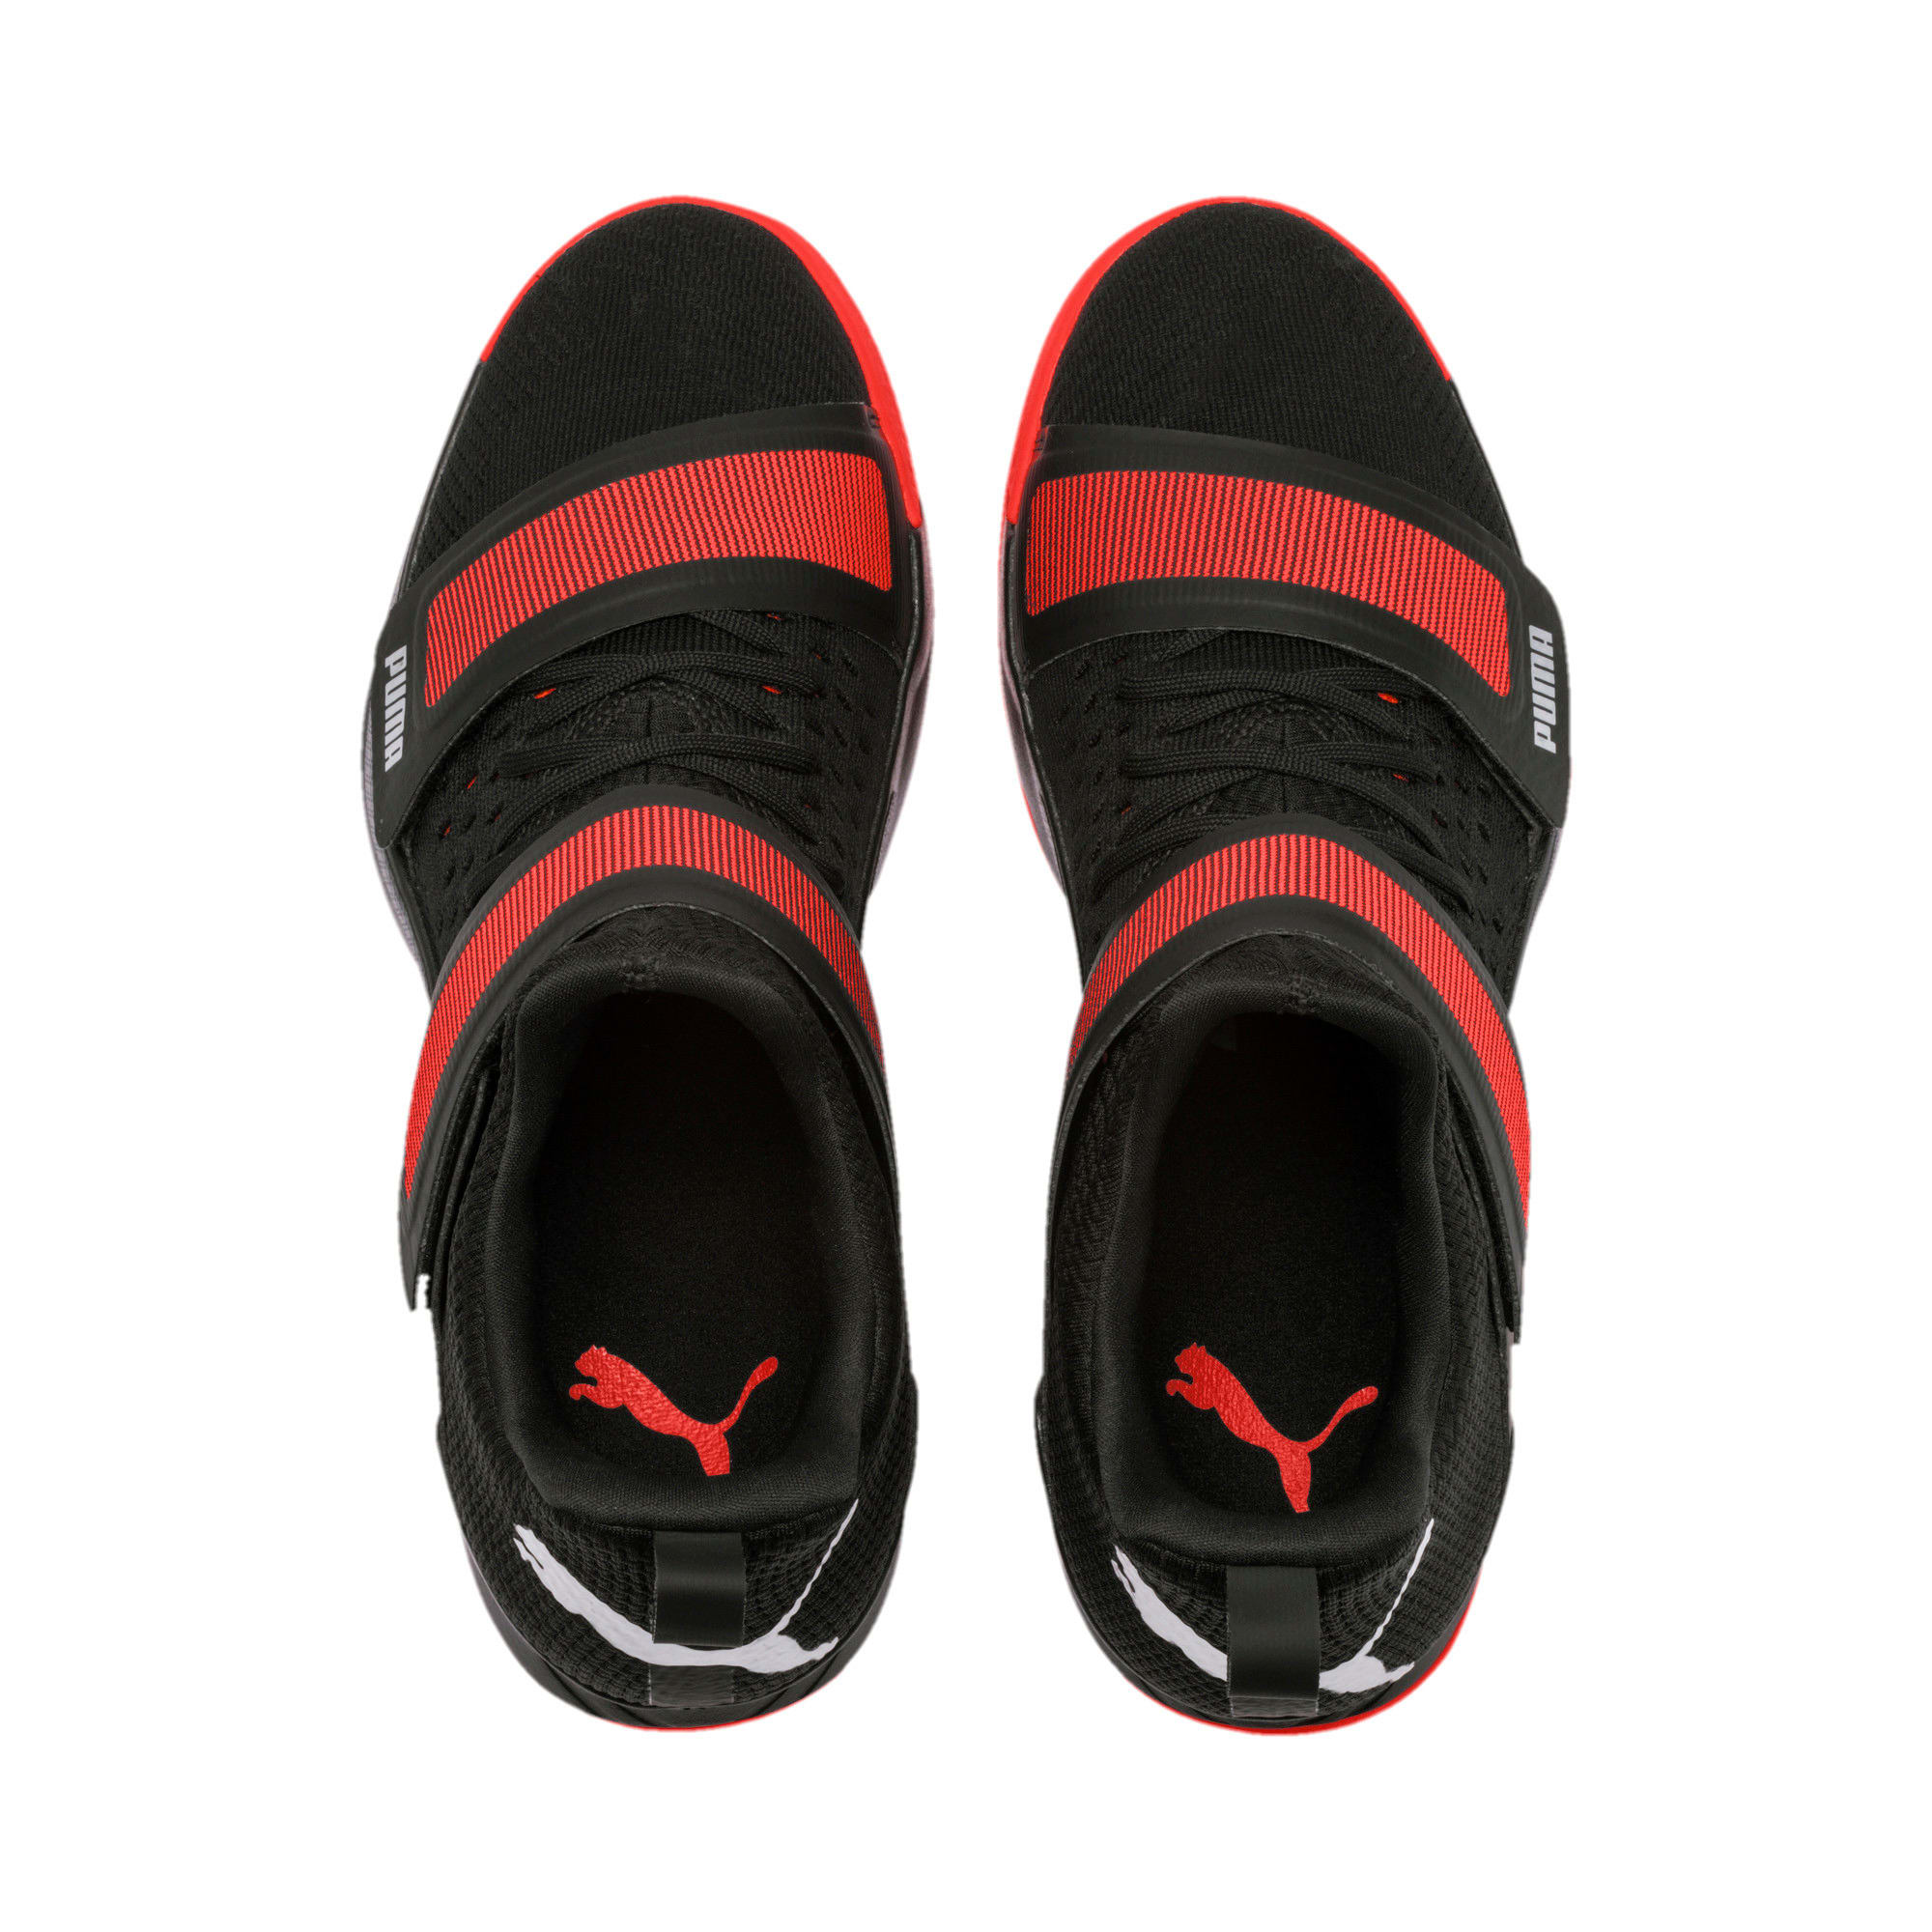 Thumbnail 7 of Rise XT3 NETFIT Handball Shoes, Puma Black-Silver-Nrgy Red, medium